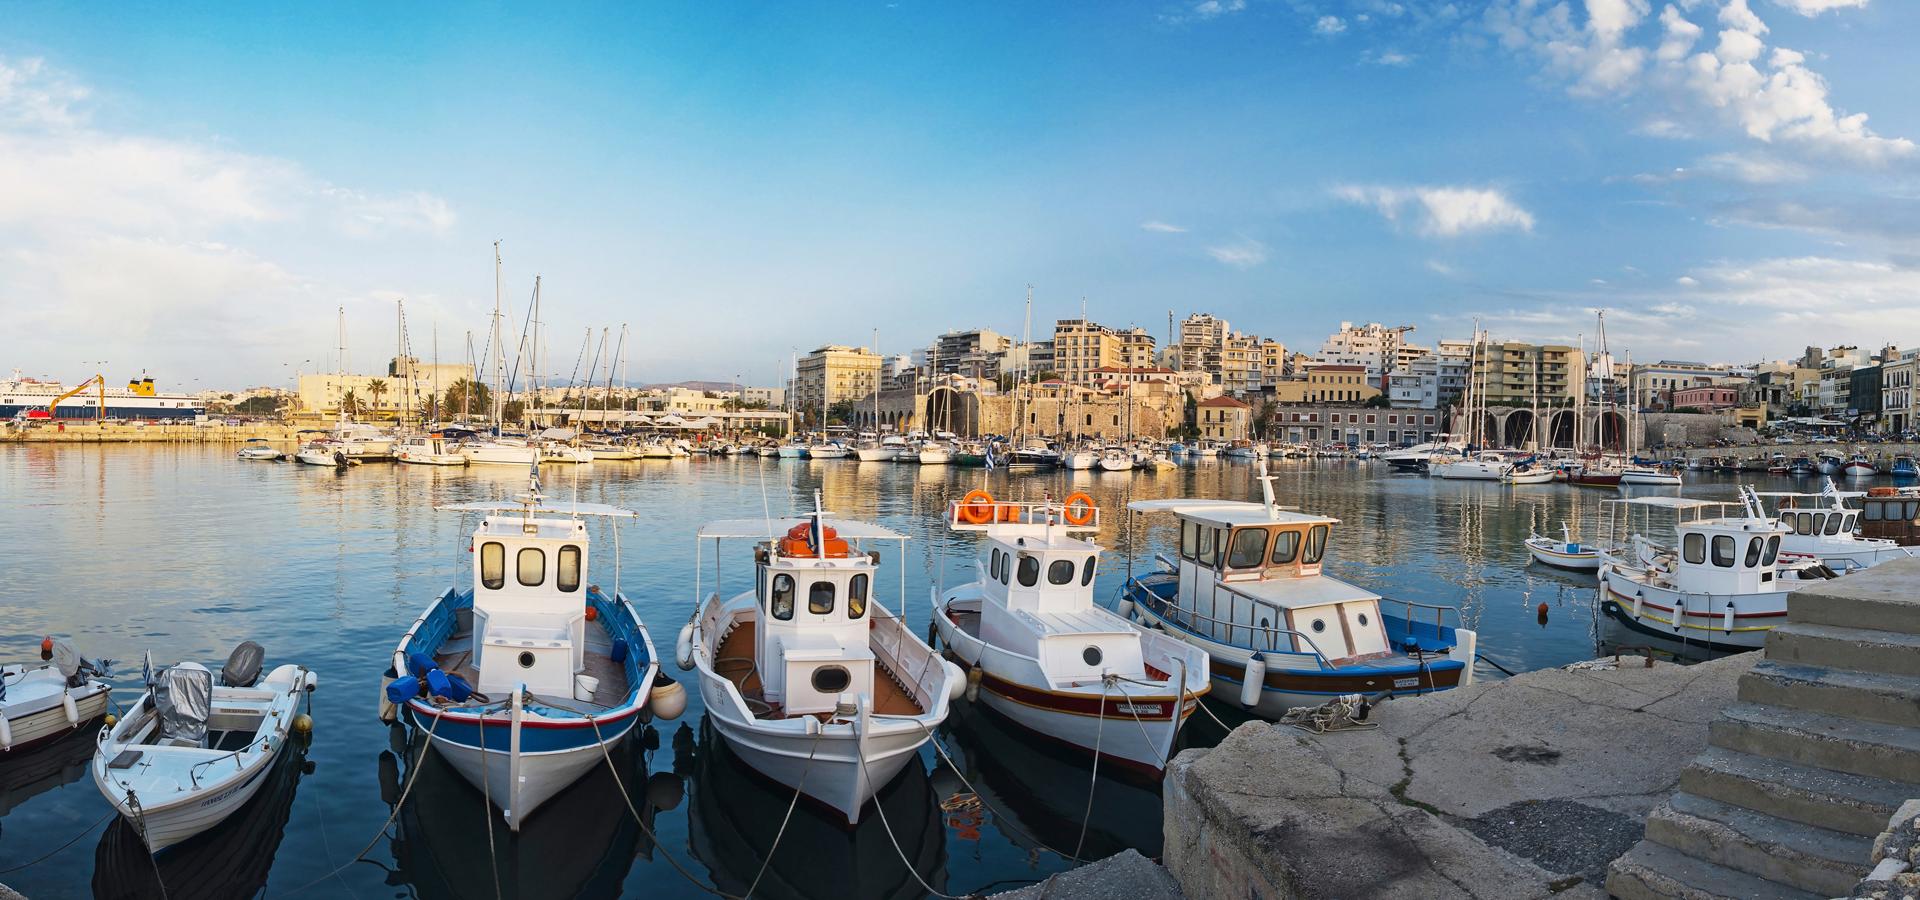 <b>Europe/Athens/Crete</b>